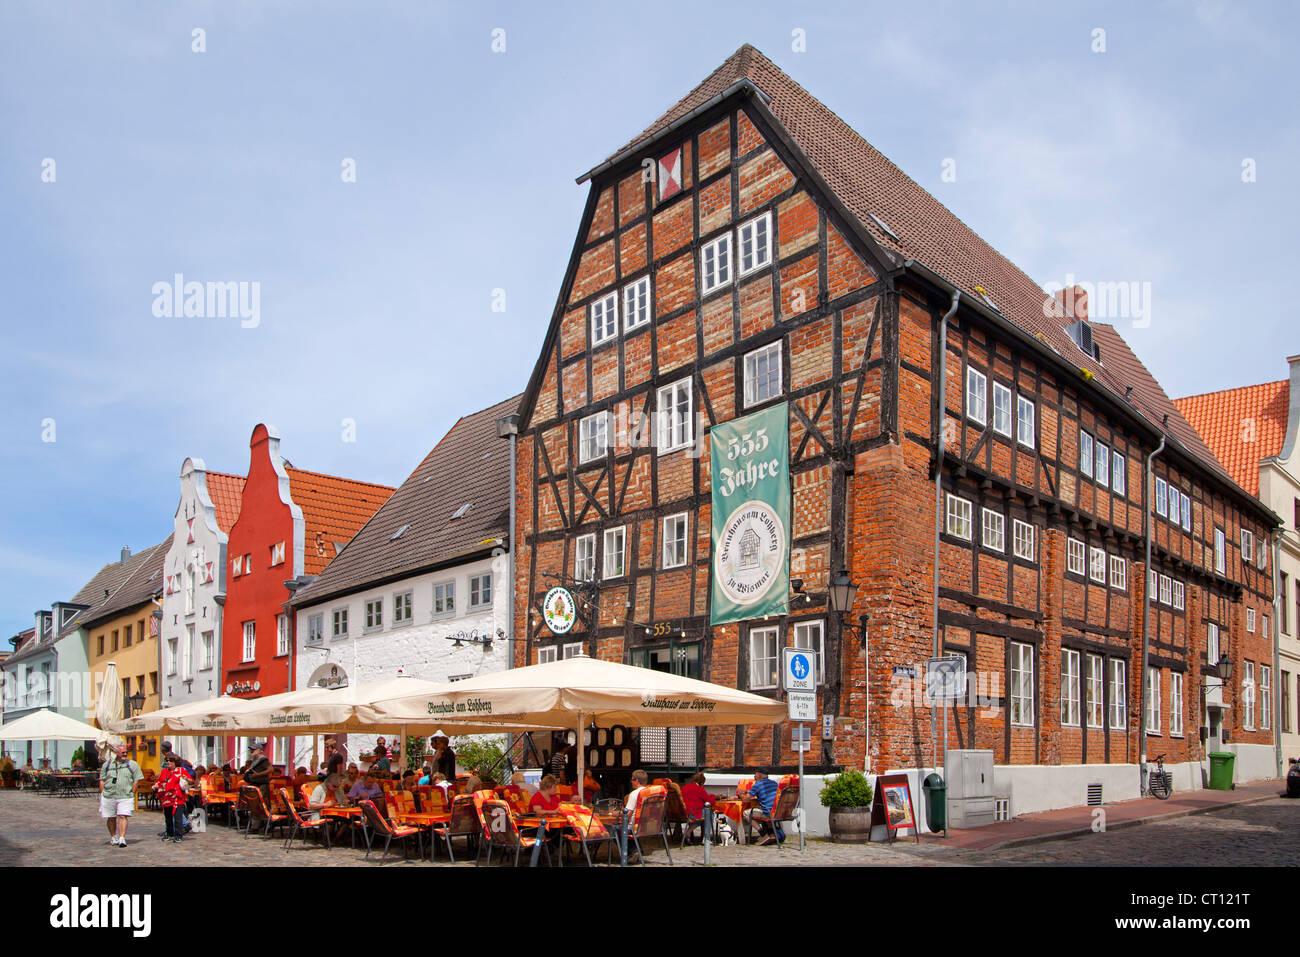 restaurants, Am Lohberg, Wismar, Mecklenburg-West Pomerania, Germany - Stock Image